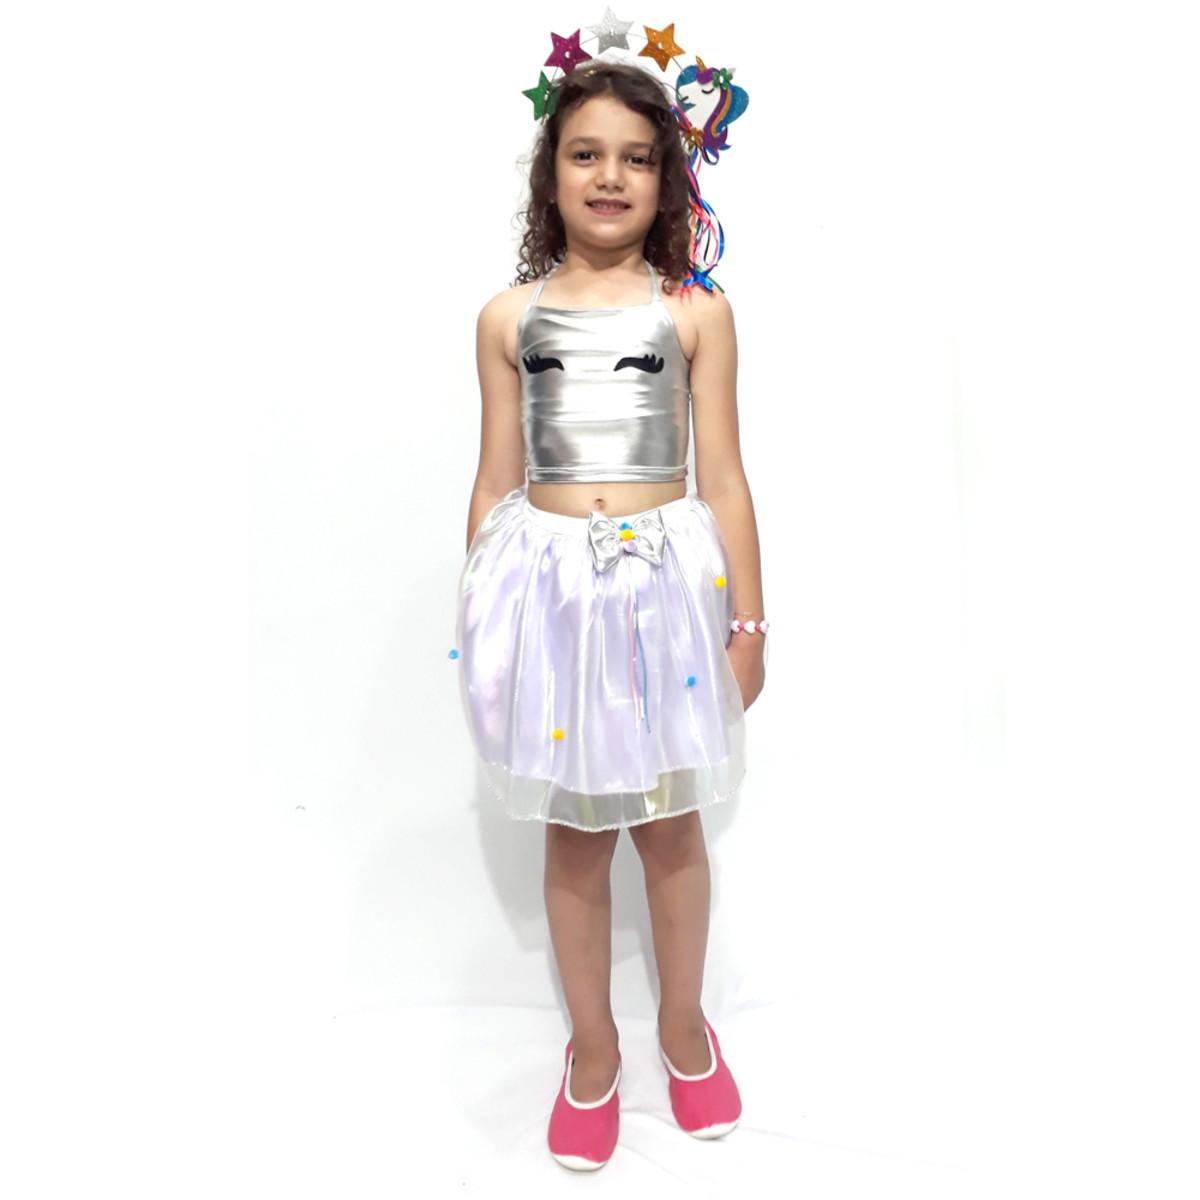 Fantasia Conjunto Unicornio Infantil Feminina No Elo7 Fantasias Fantastica Ec4196